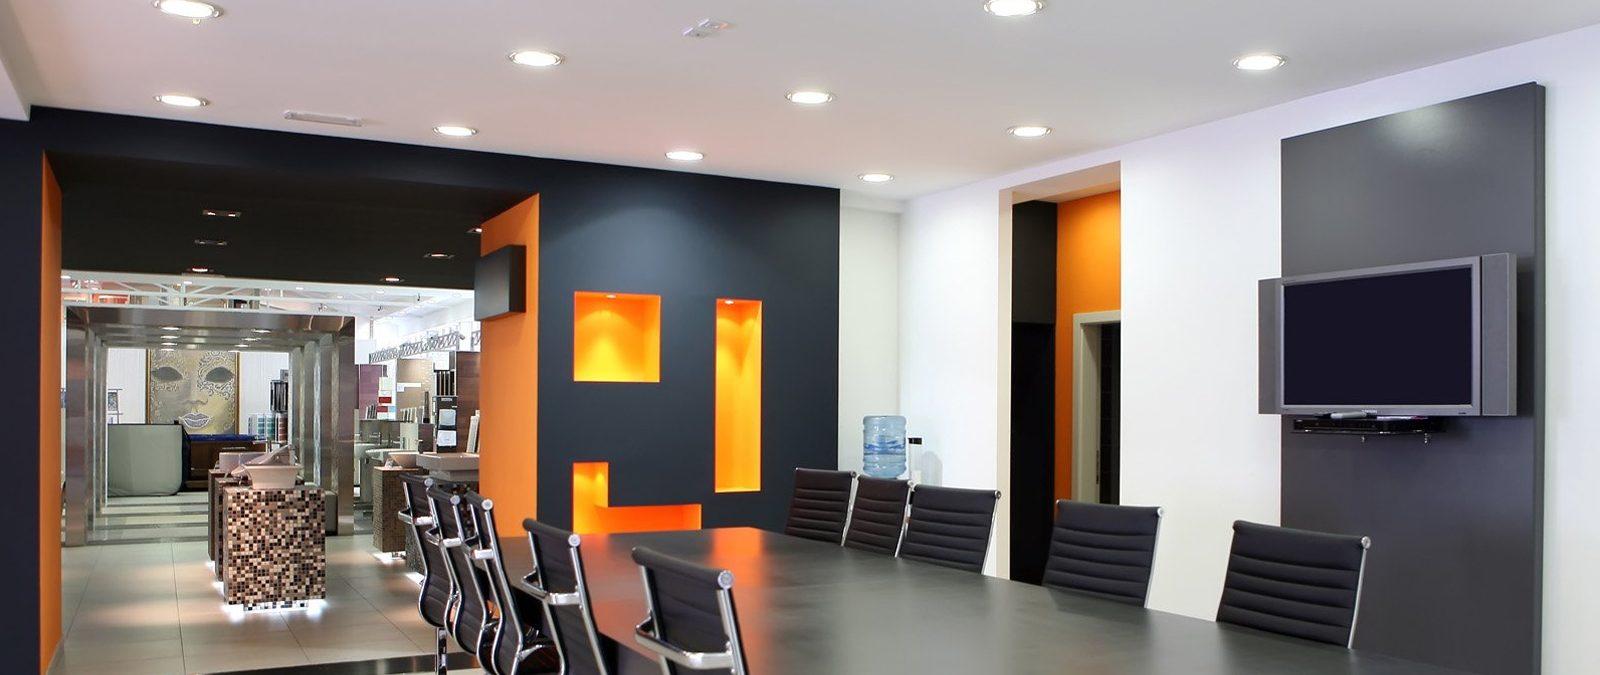 office-meeting-hall-deisgn